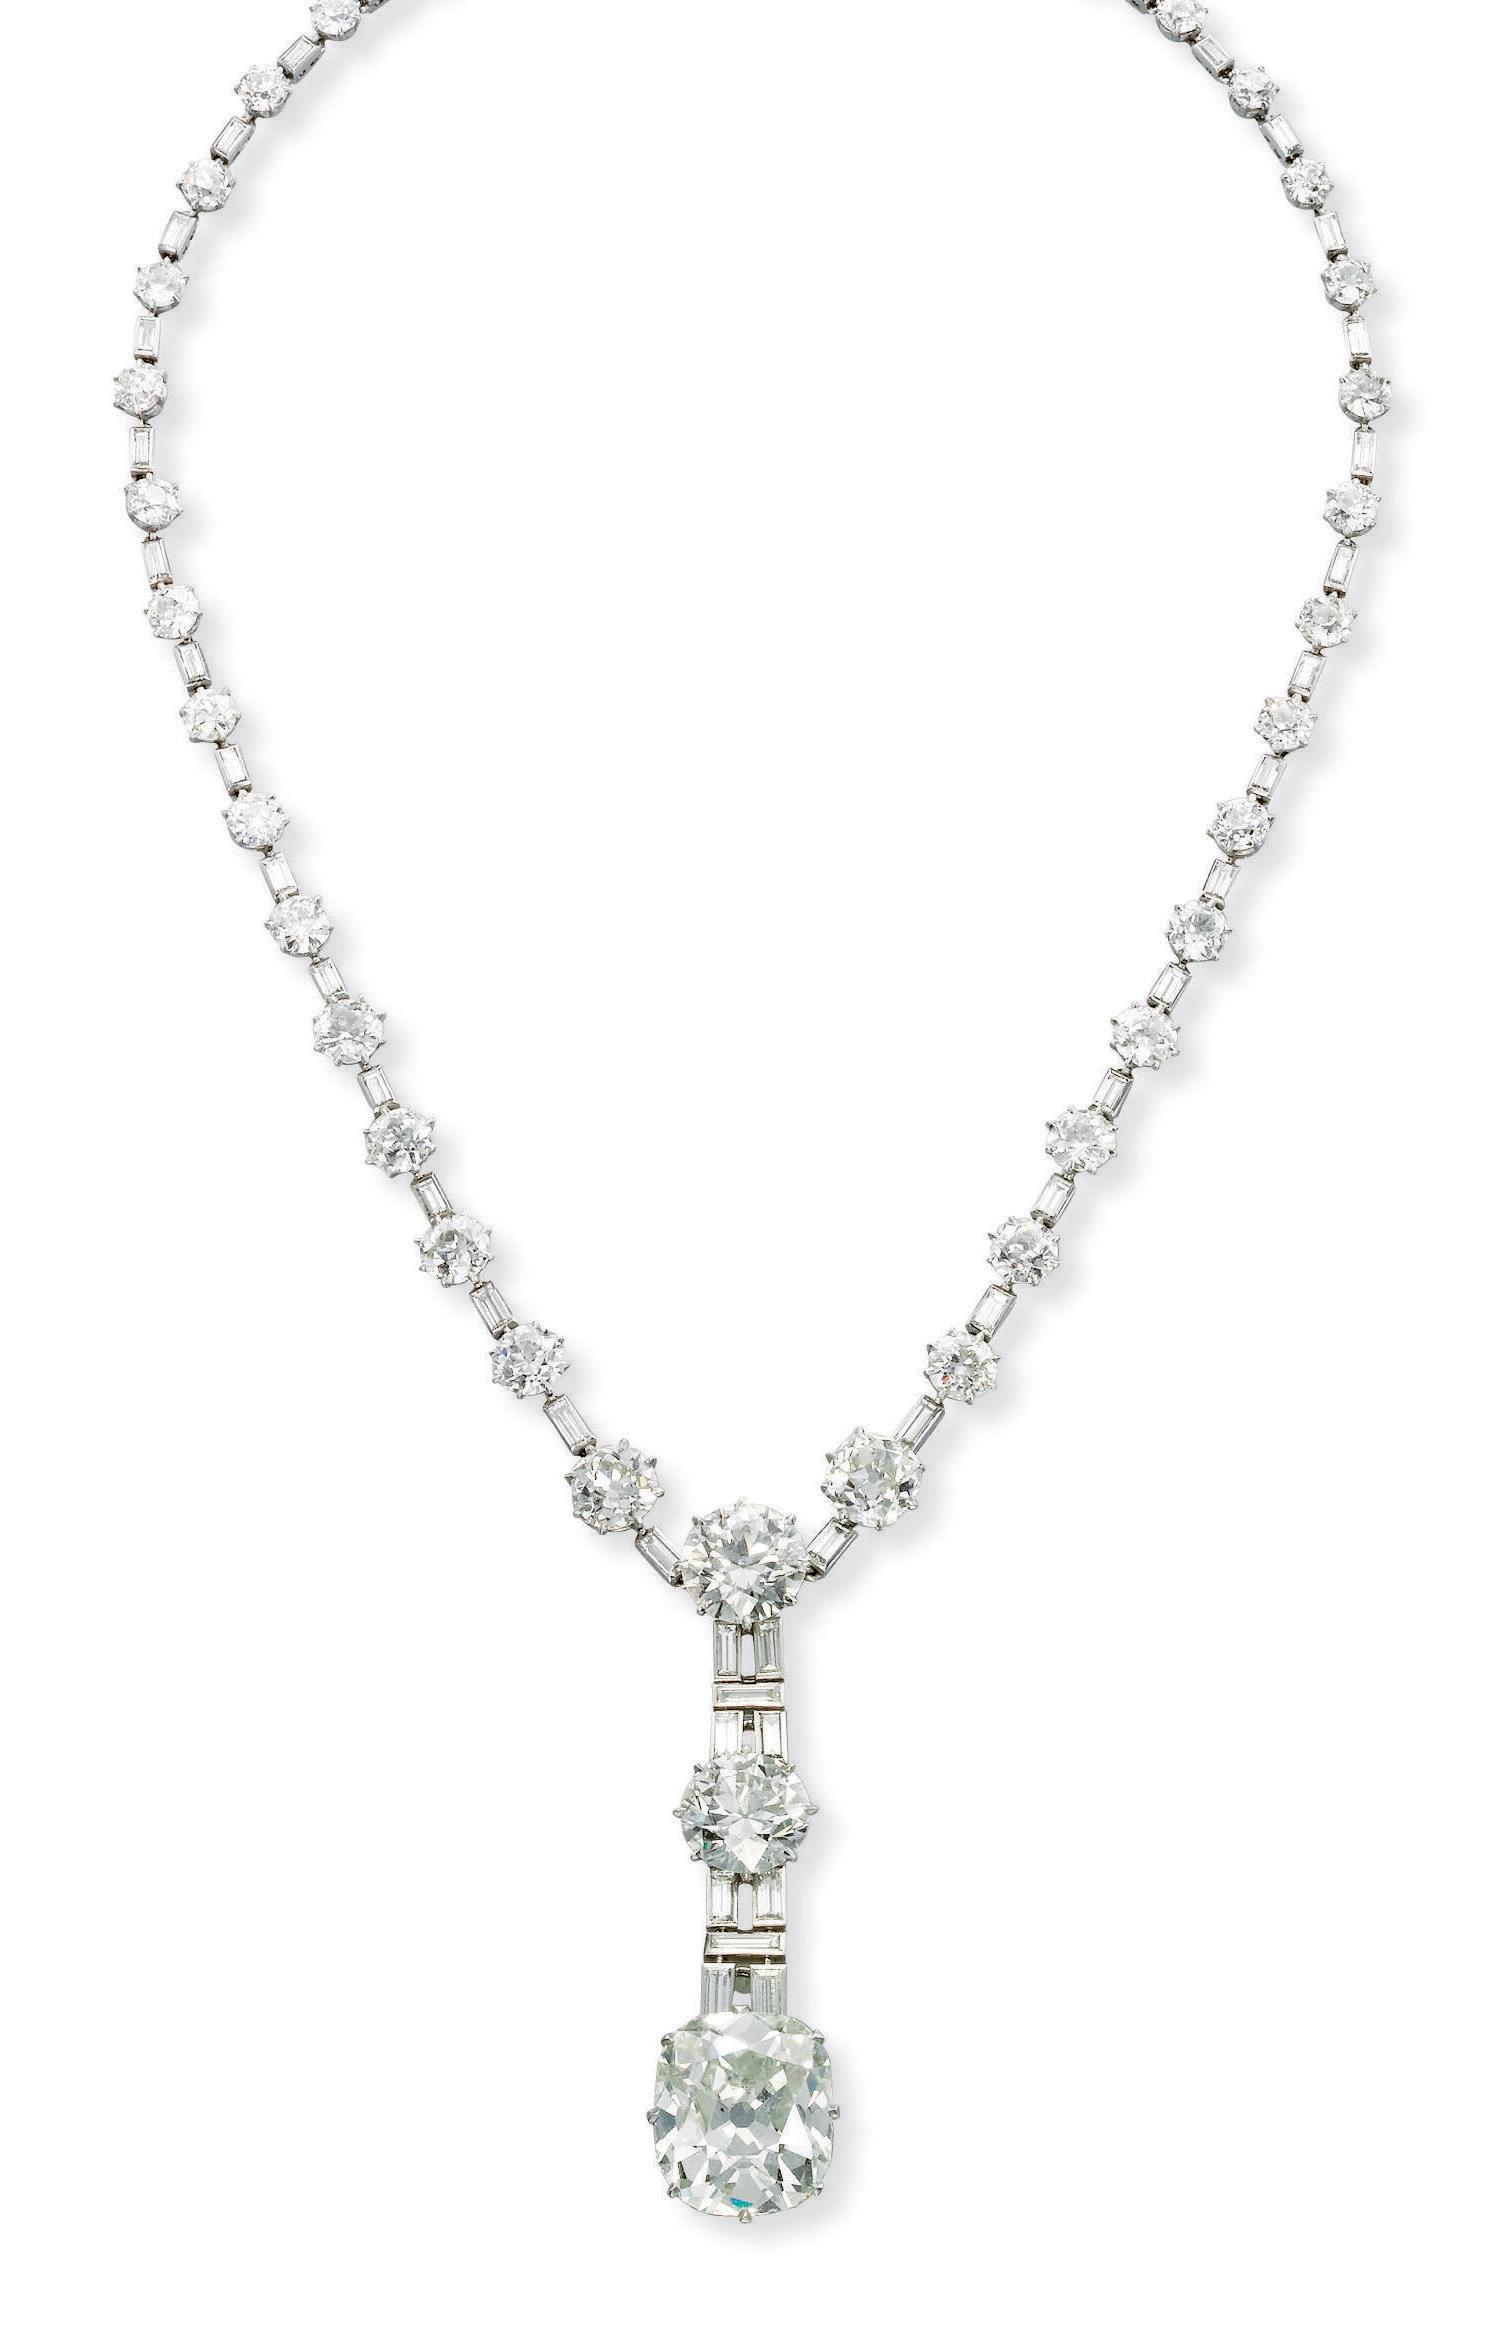 AN ELEGANT ART DECO DIAMOND NECKLACE, BY CHAUMET